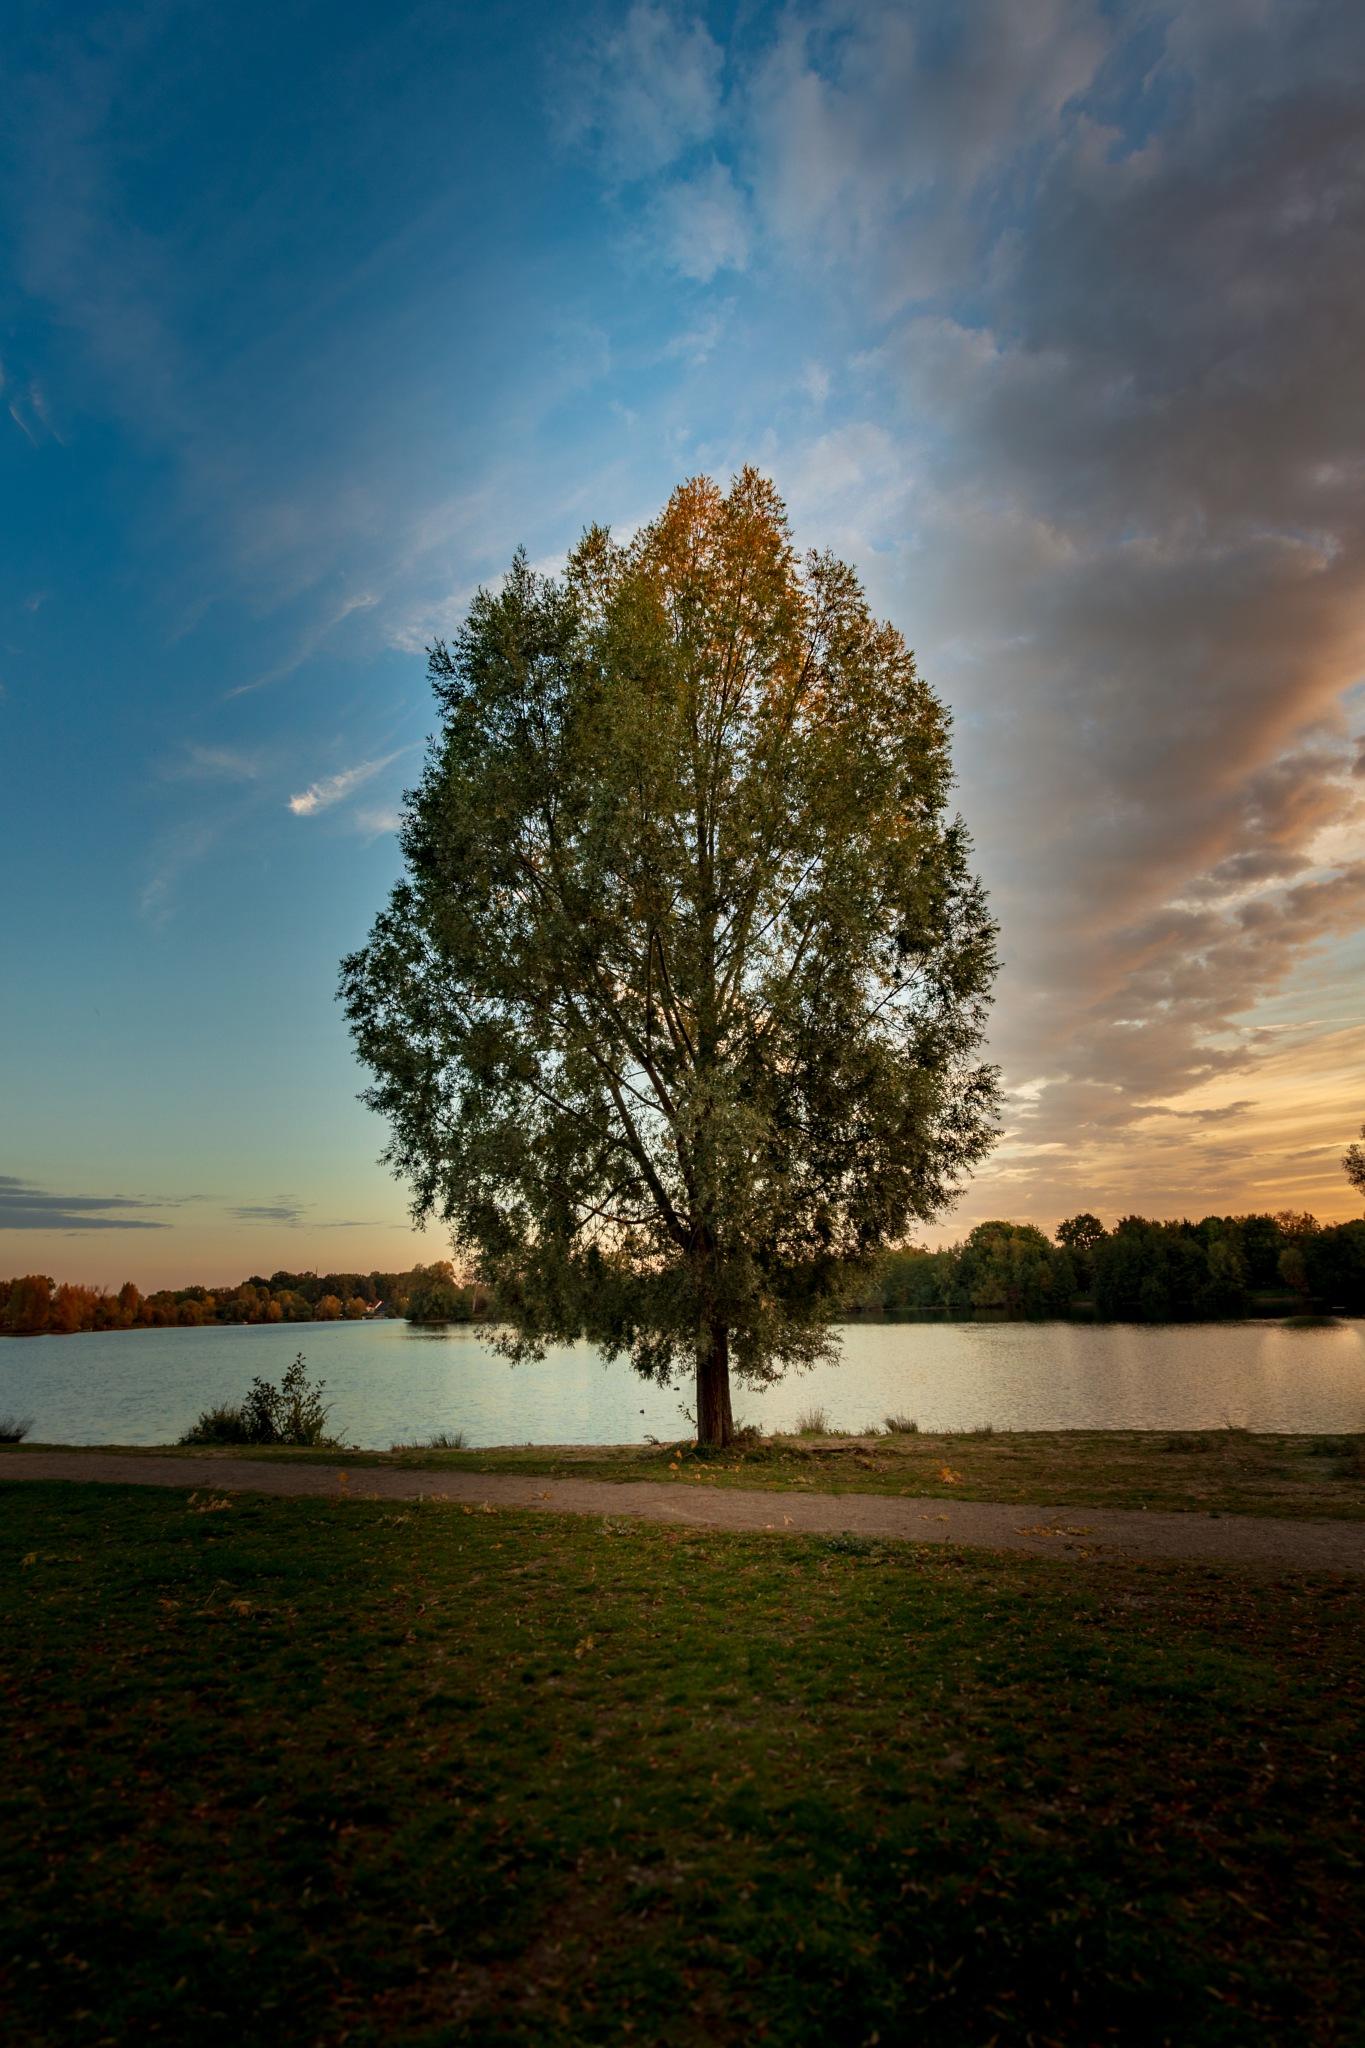 Tree at Lago Laprello by Rene Hilgers